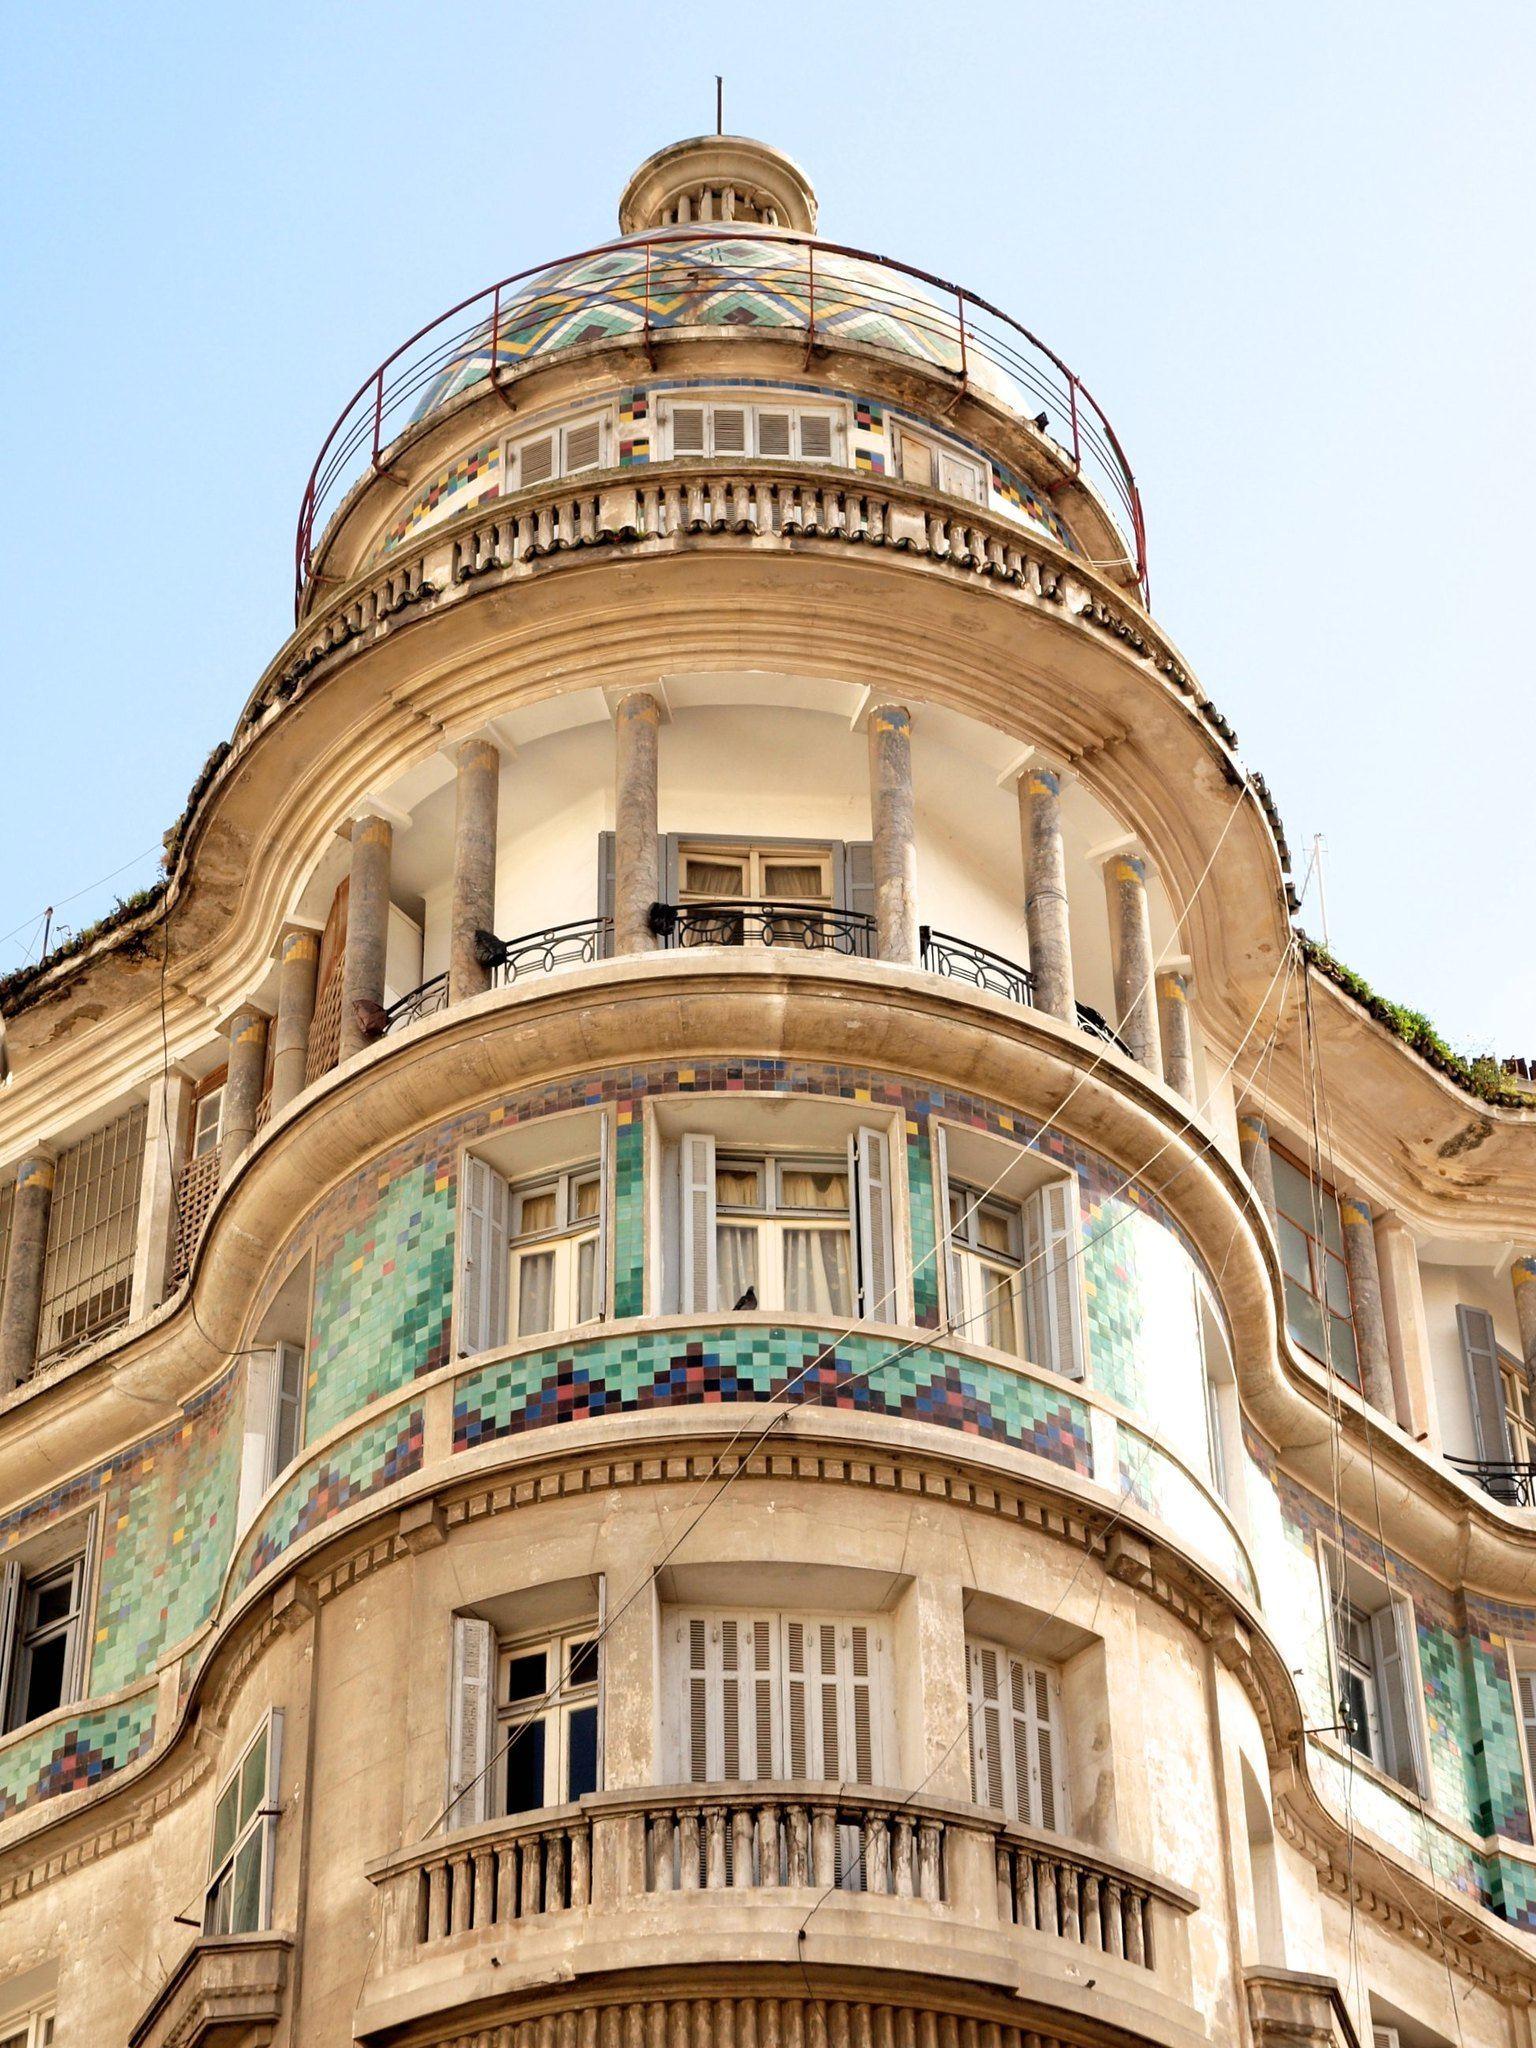 Casablanca Art Deco by Maret on Flickr